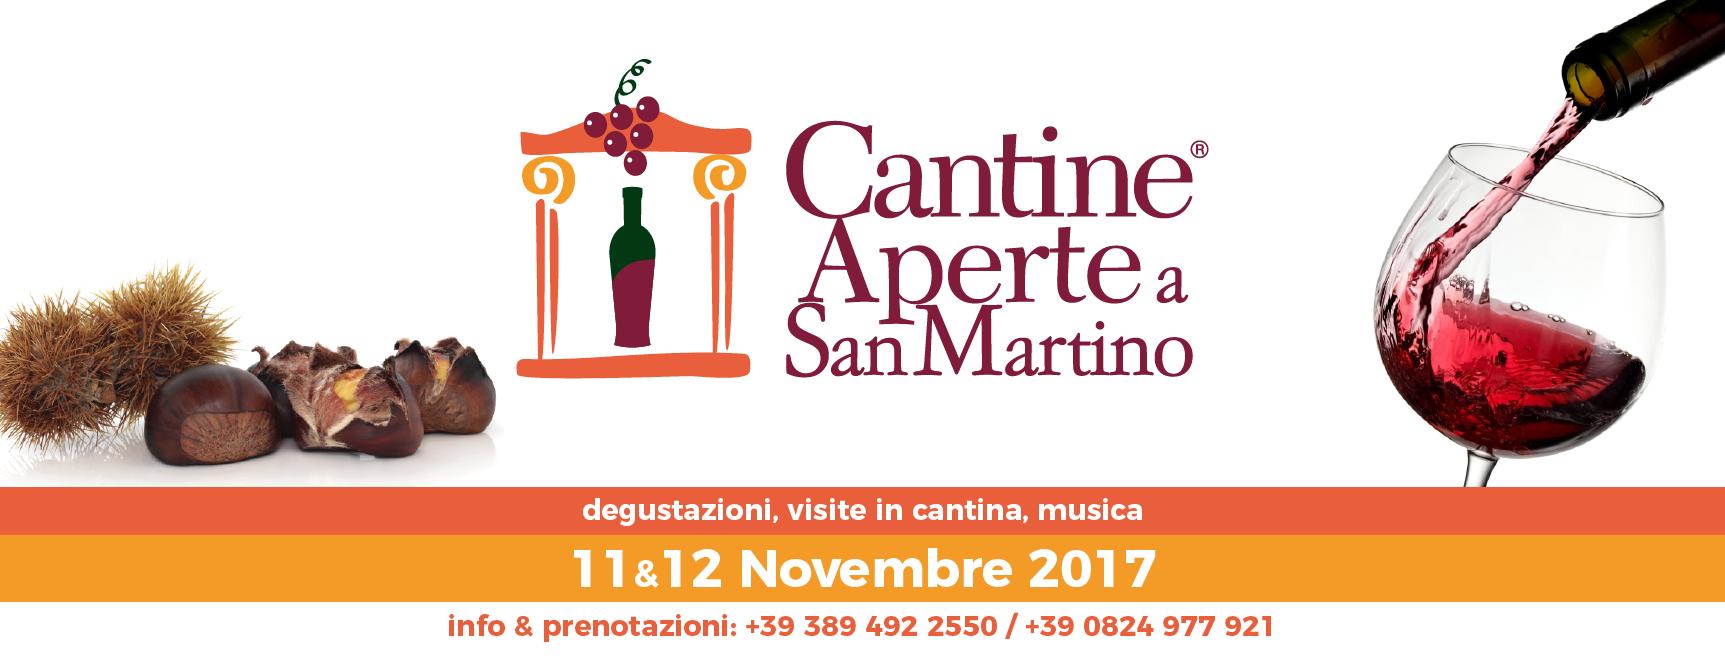 Cantine Aperte a San Martino 11 e 12 Novembre 2017